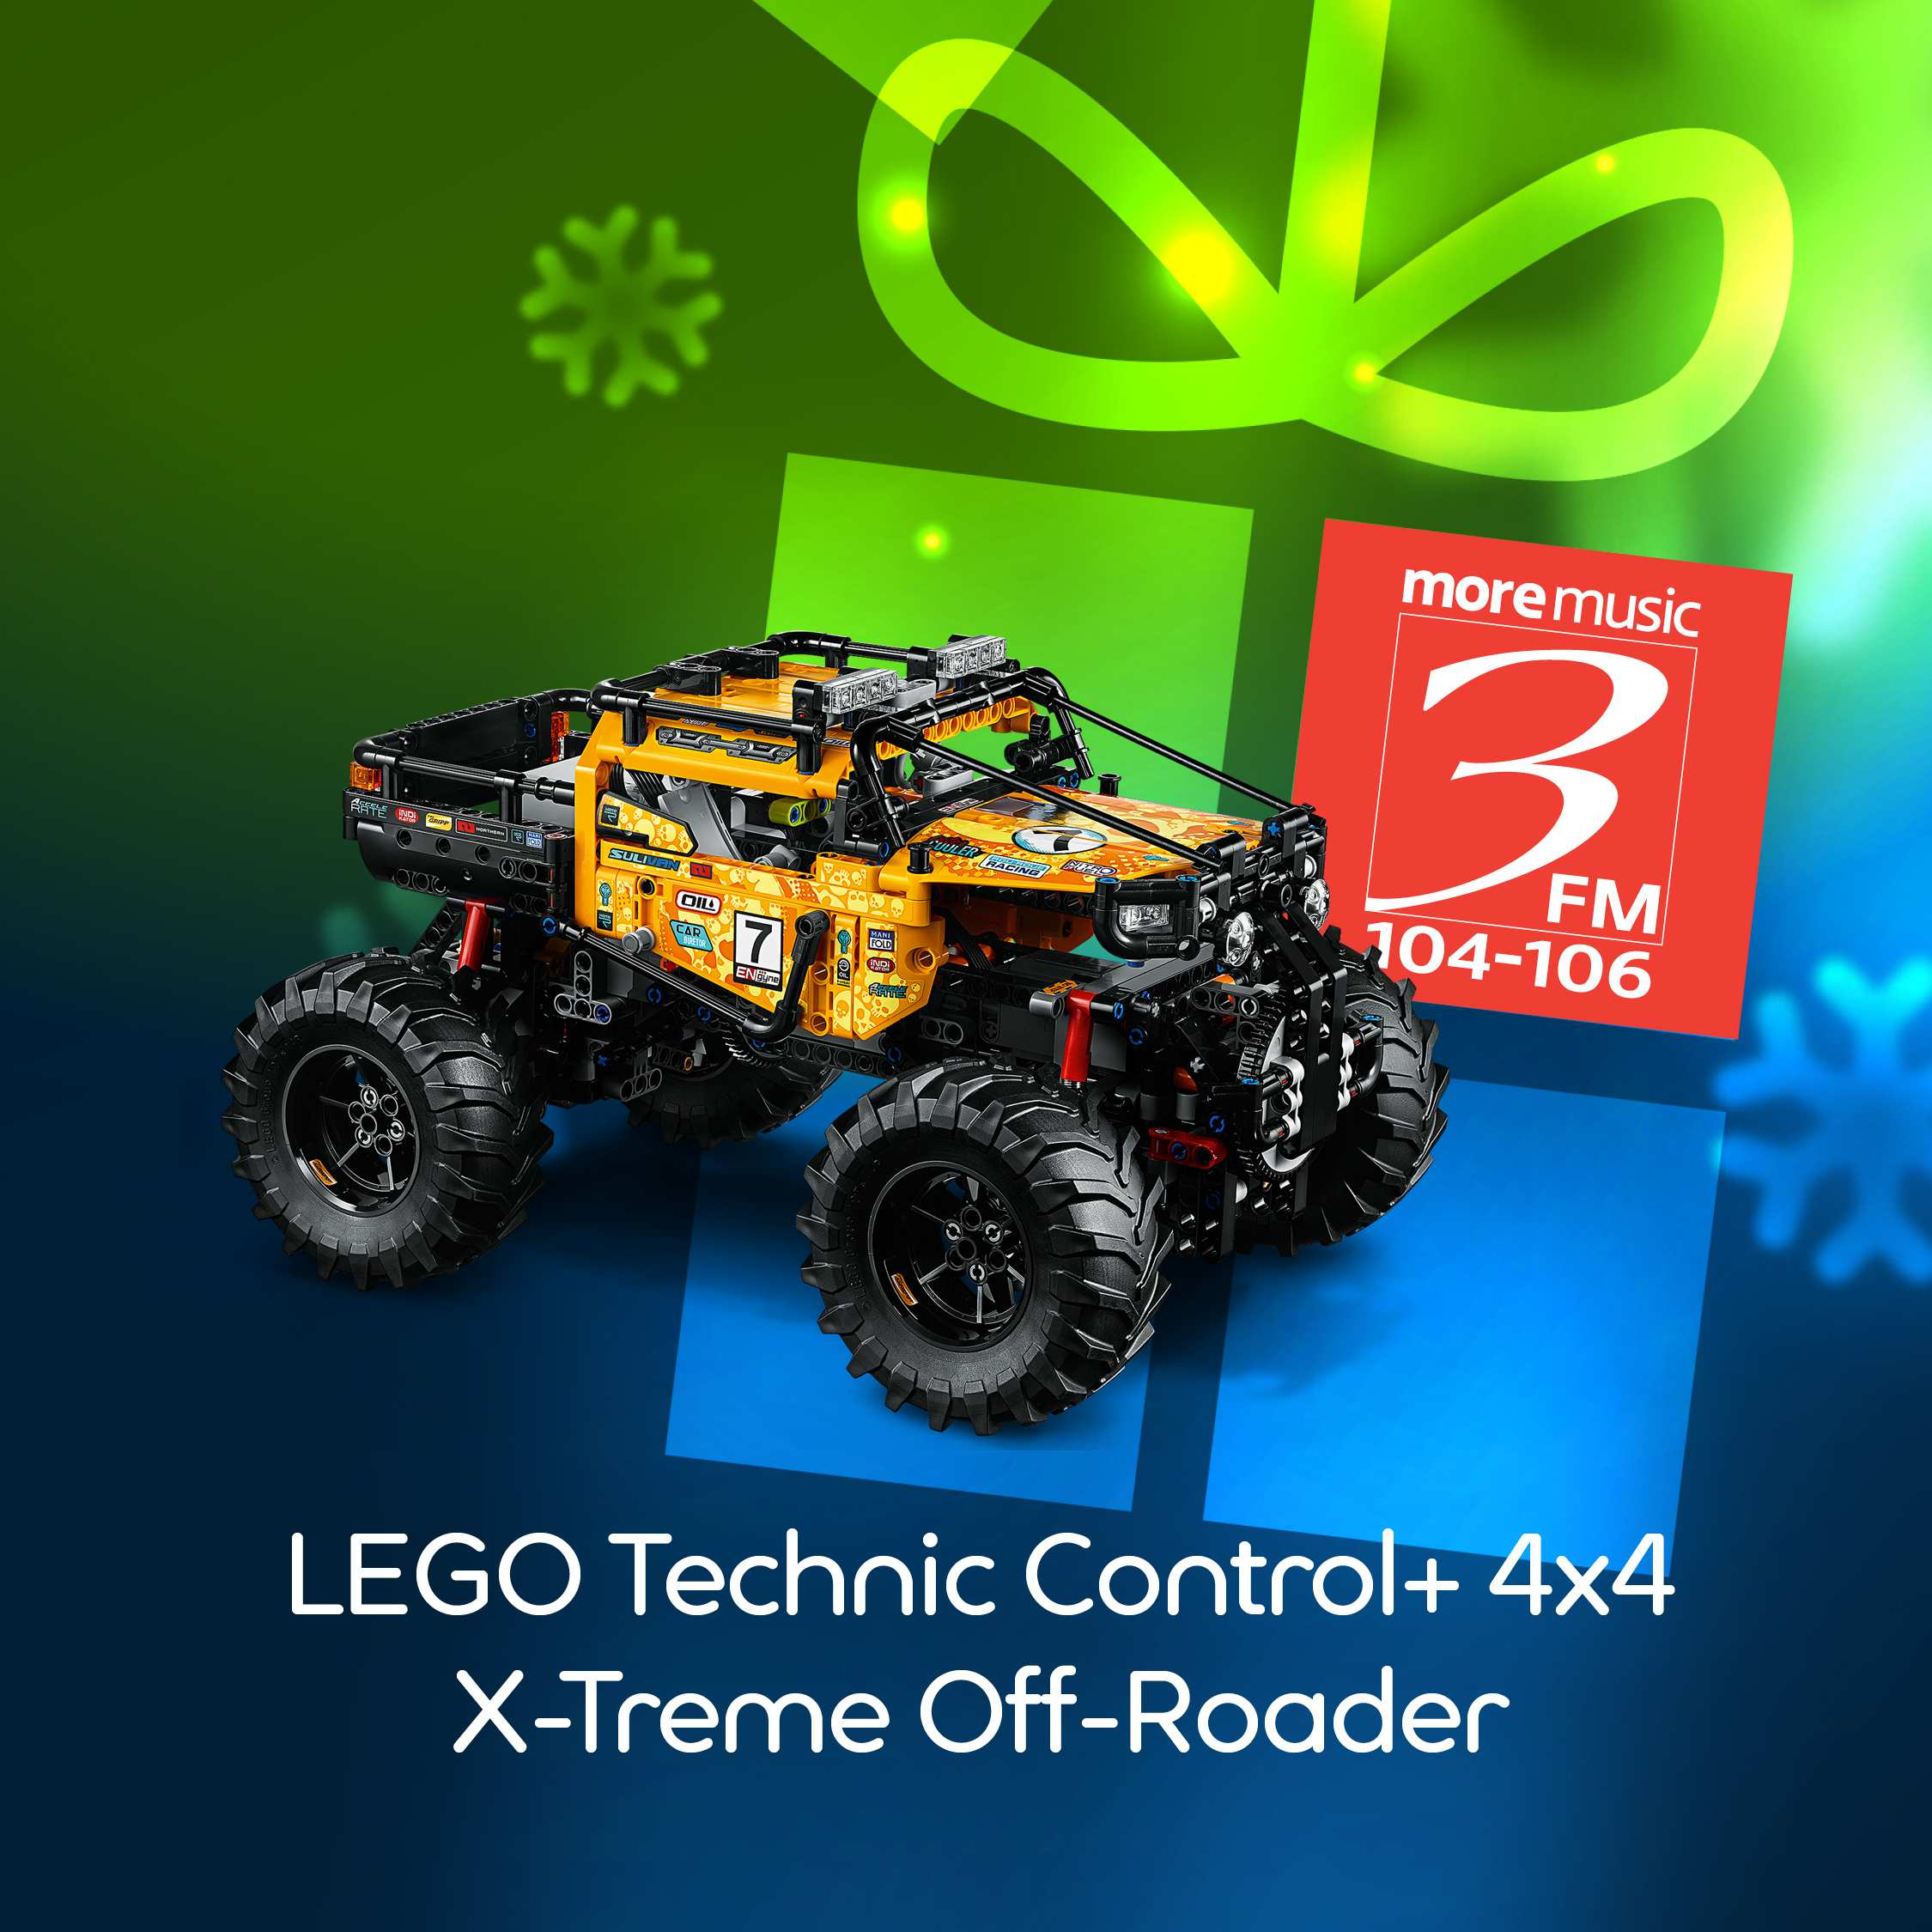 LEGO Technic Control+ 4x4 X-treme Off-Roader Set